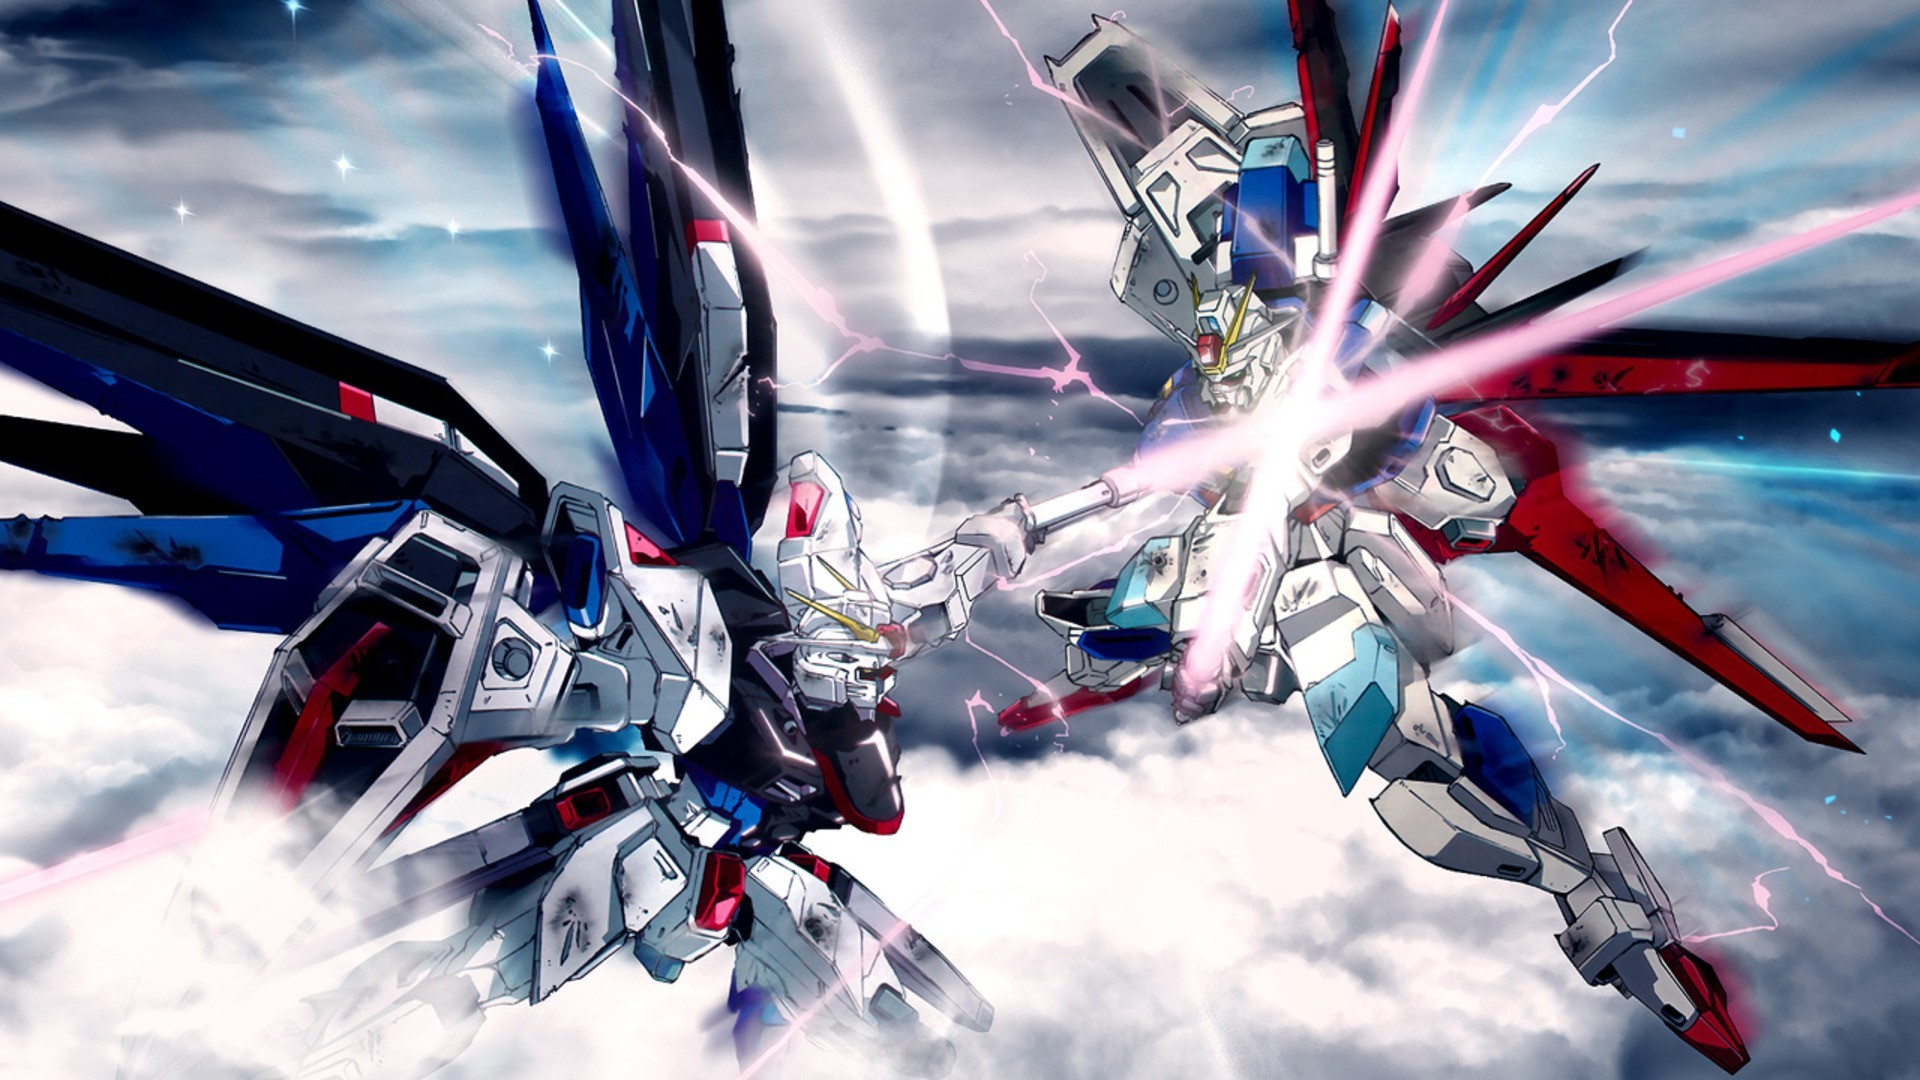 Suit Gundam Seed Destiny Wallpaper 1920x1080 Full HD Wallpapers 1920x1080